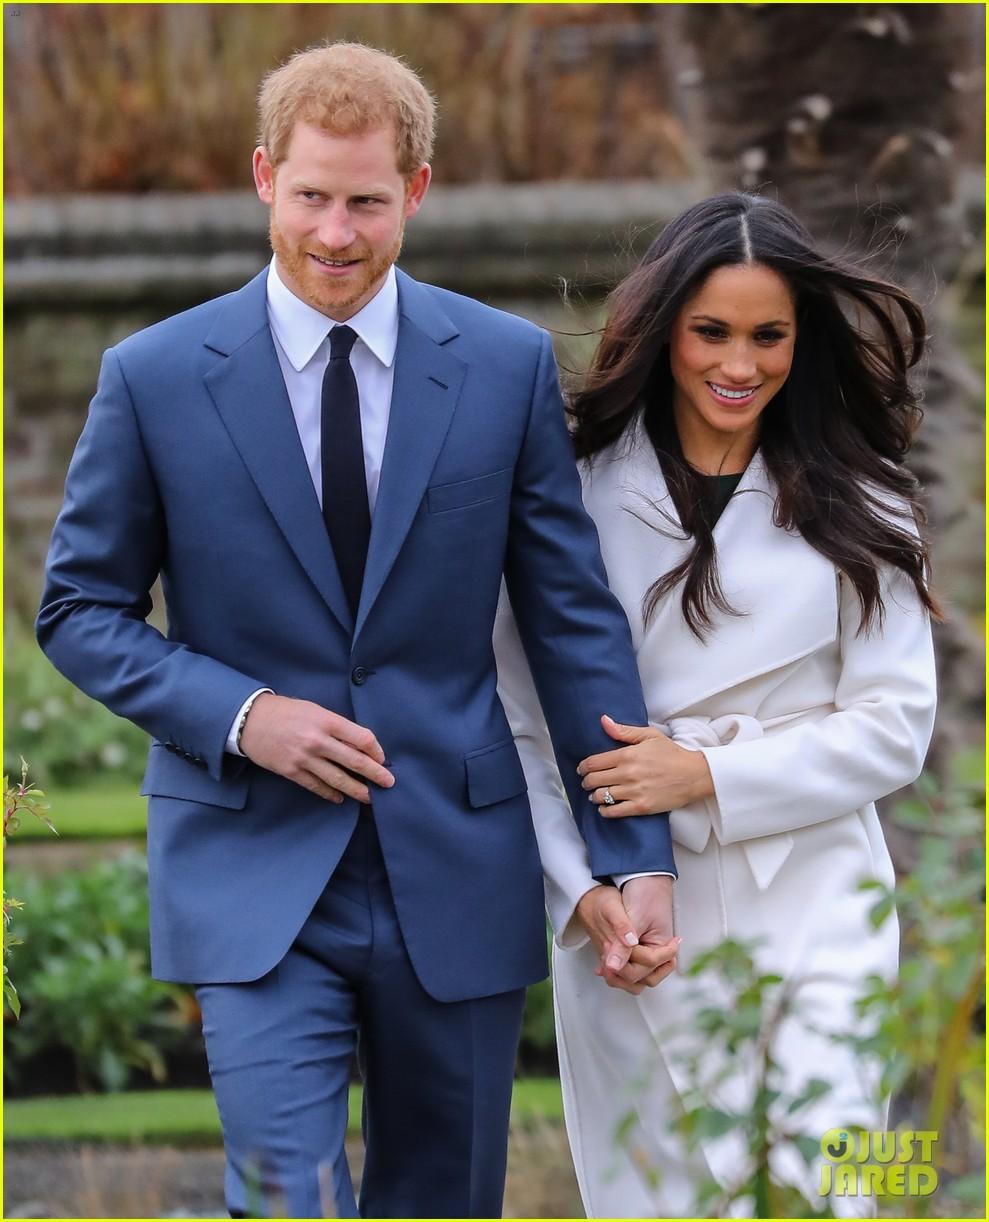 Prince Harry & Meghan Markle's Wedding Month, Location